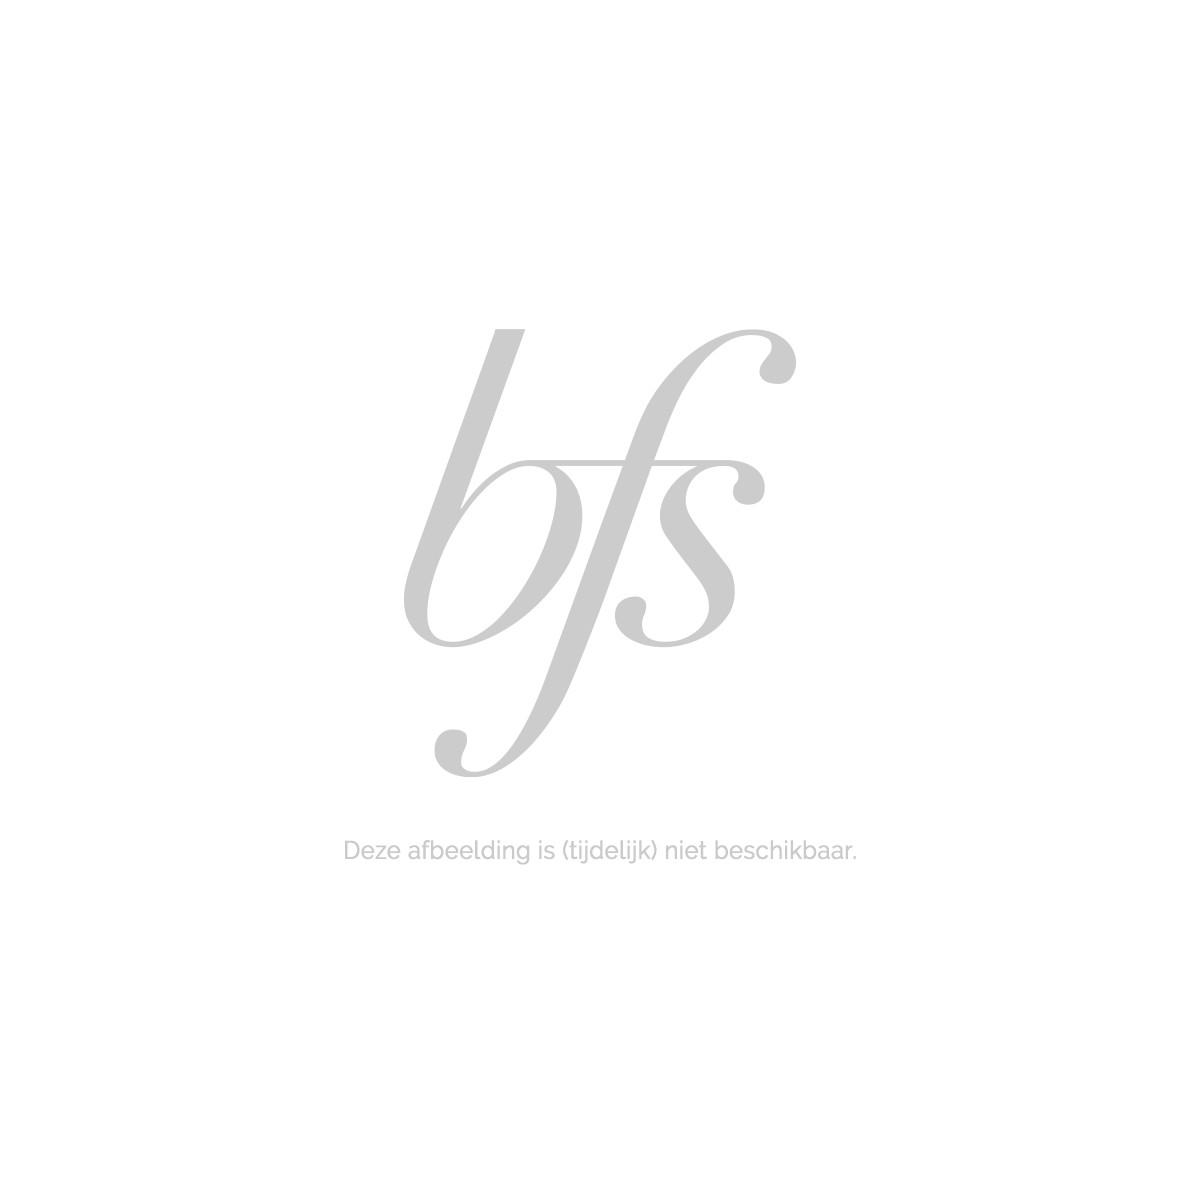 Afbeelding van Dibi Milano Face Perfection Uv Shield Spf30 Zelfbruiner/Tanning Beauty